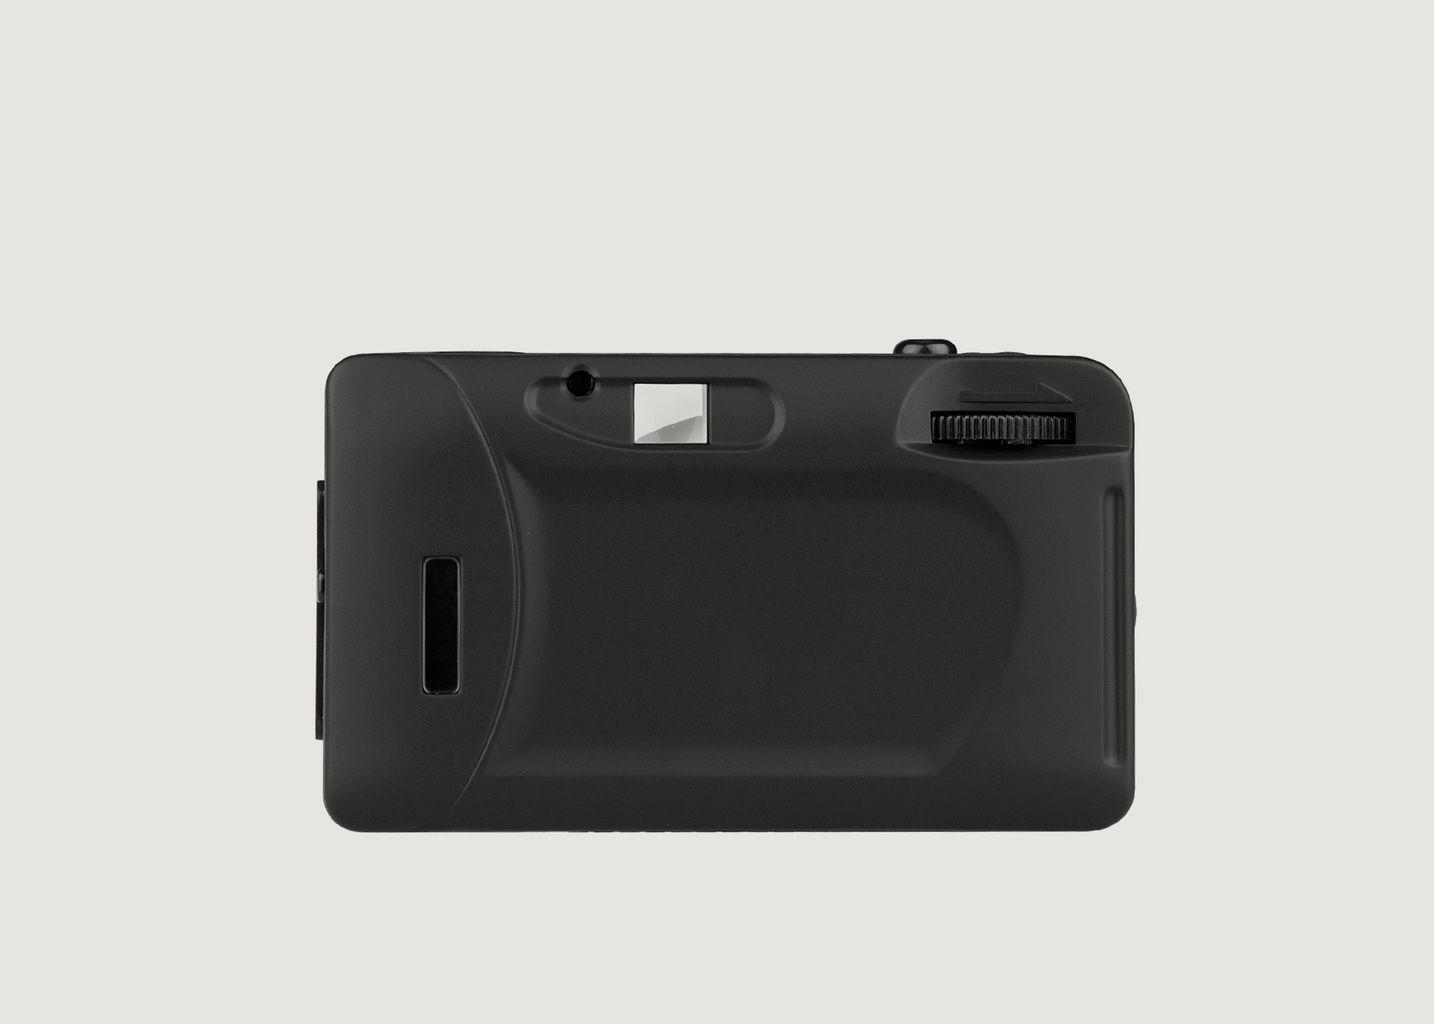 Fisheye One 35 mm Camera All Black - Lomography